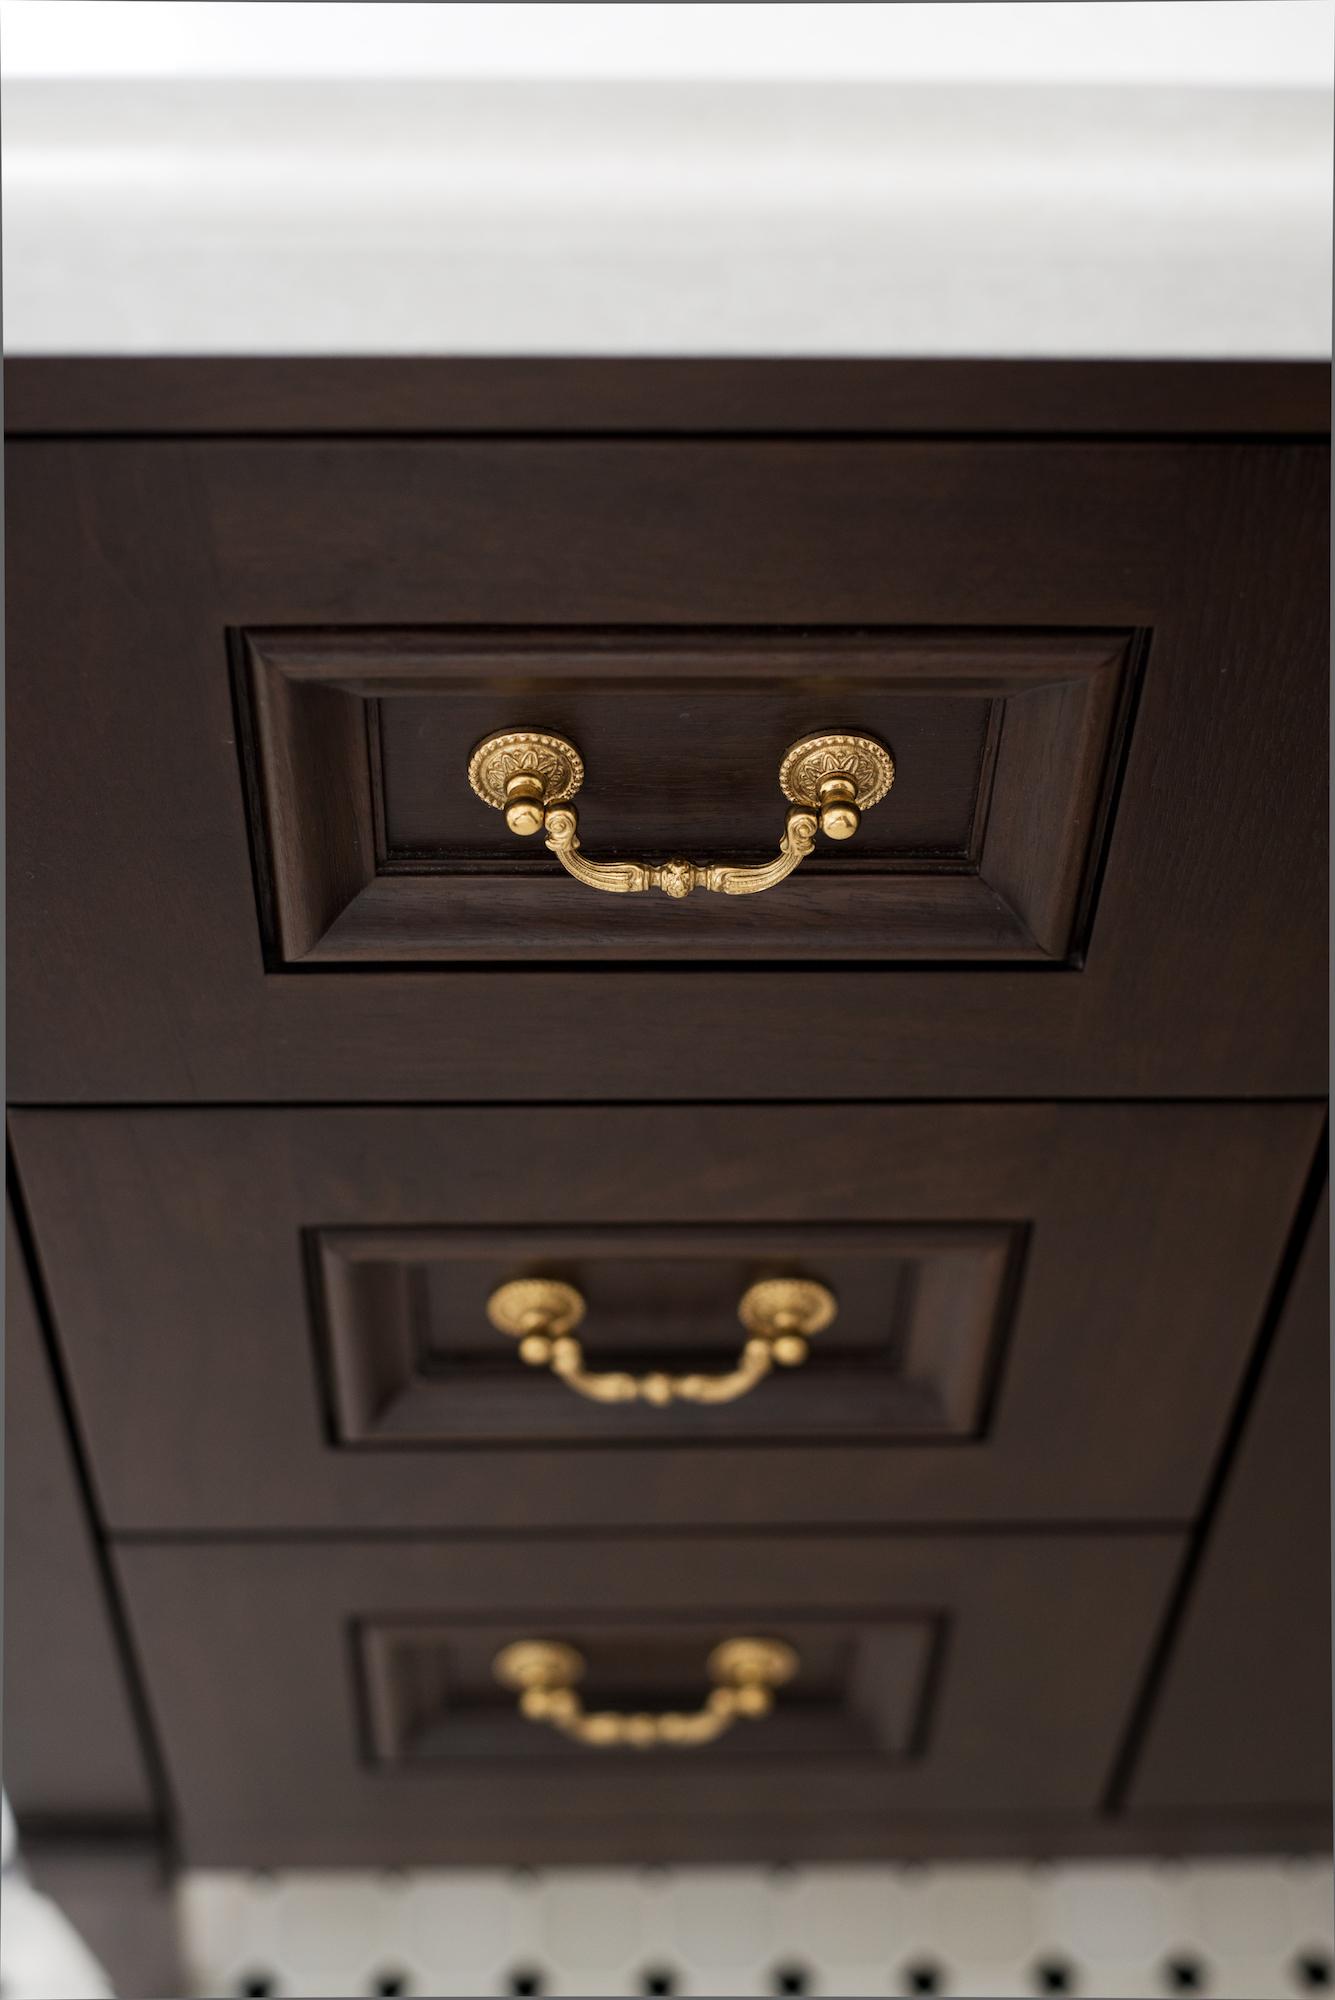 14 Pizzale Design Interior Decorating  bathroom dark wood gold hardware.jpg